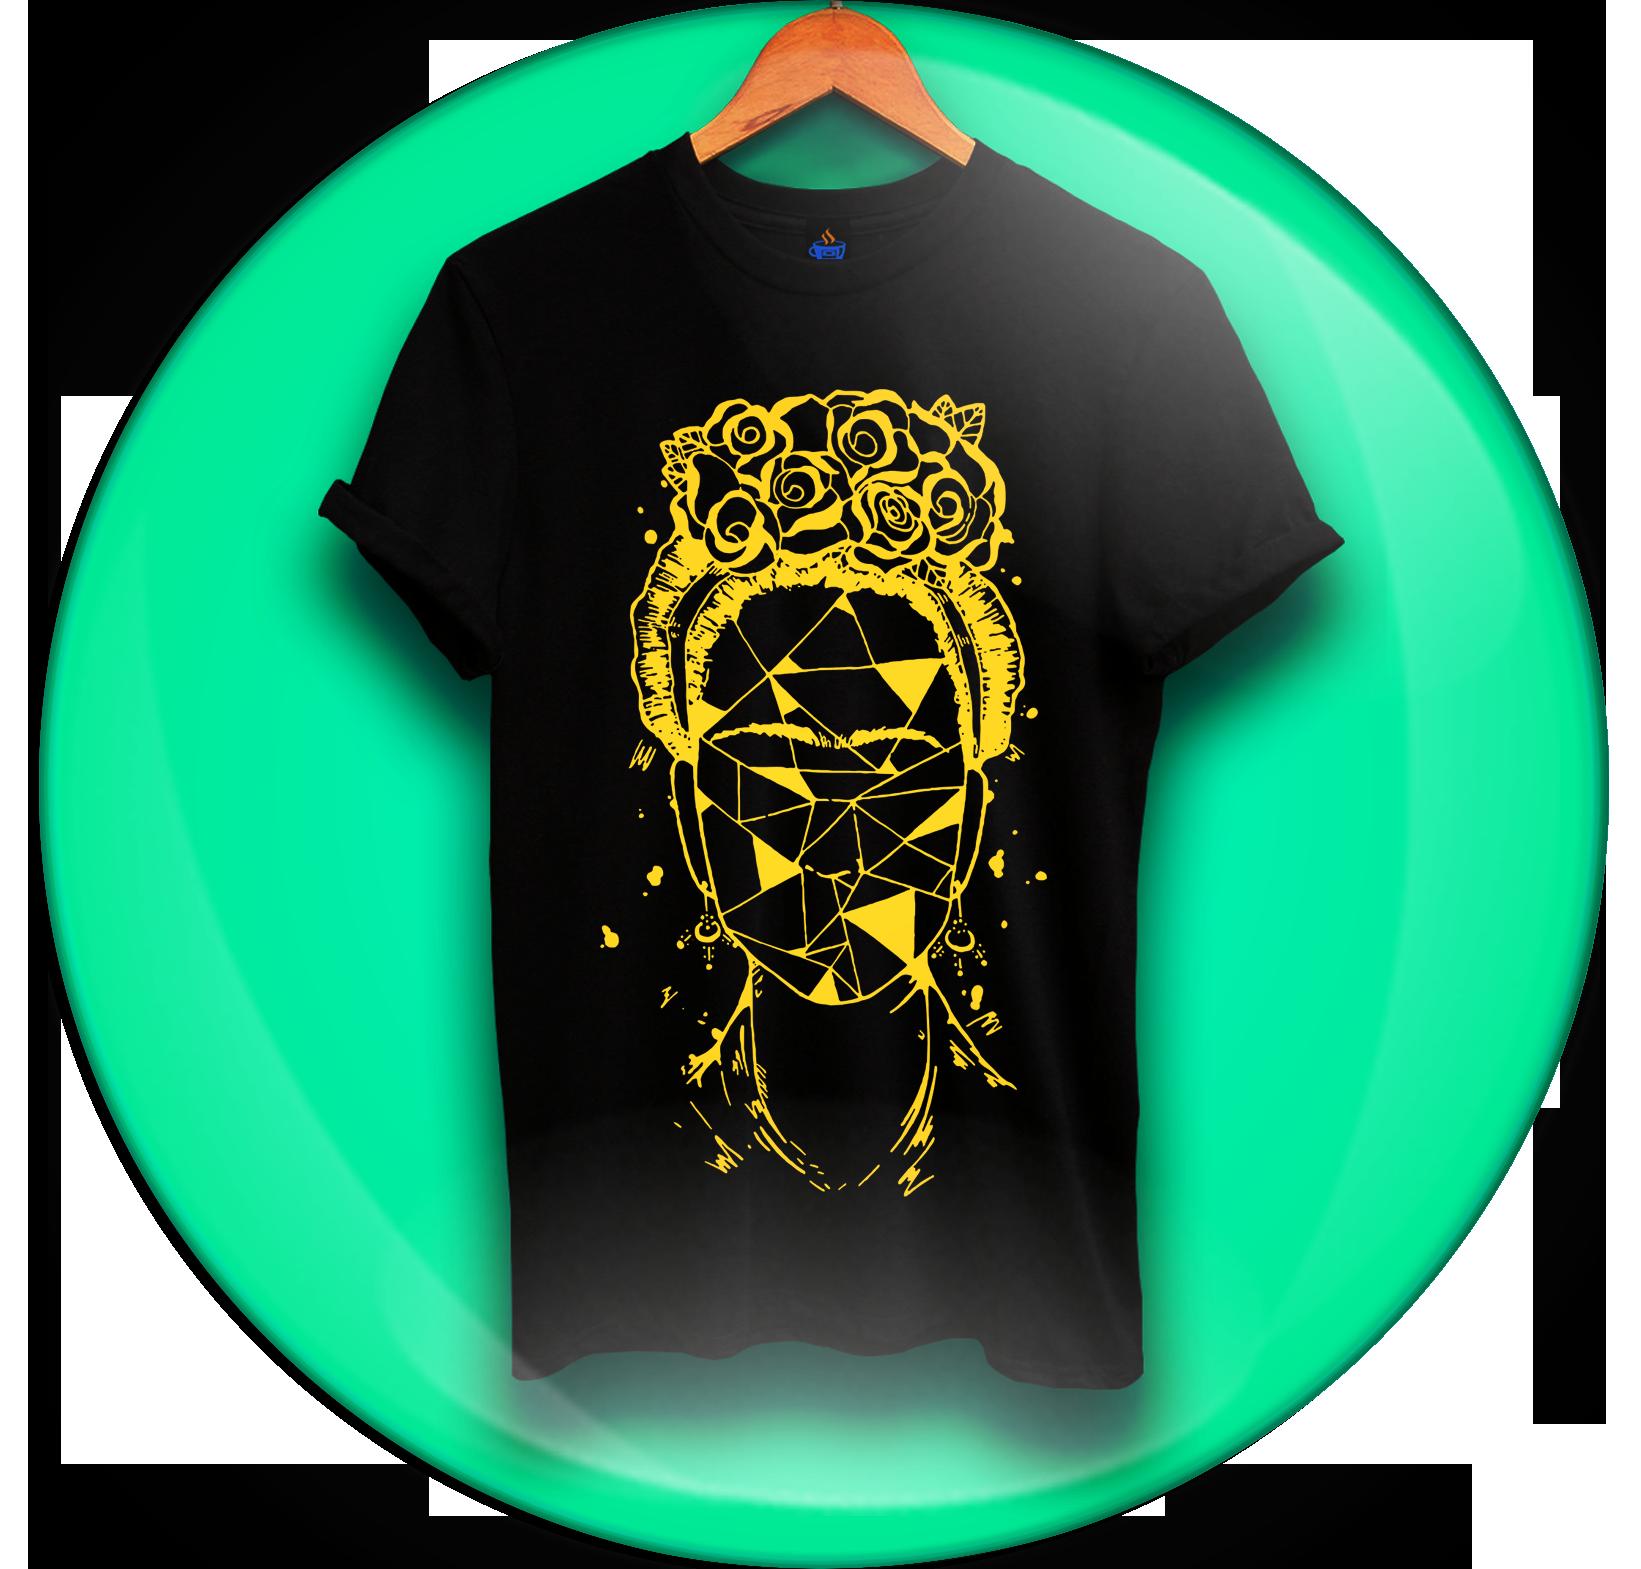 Camisetas Alternativas - Frida Kahlo